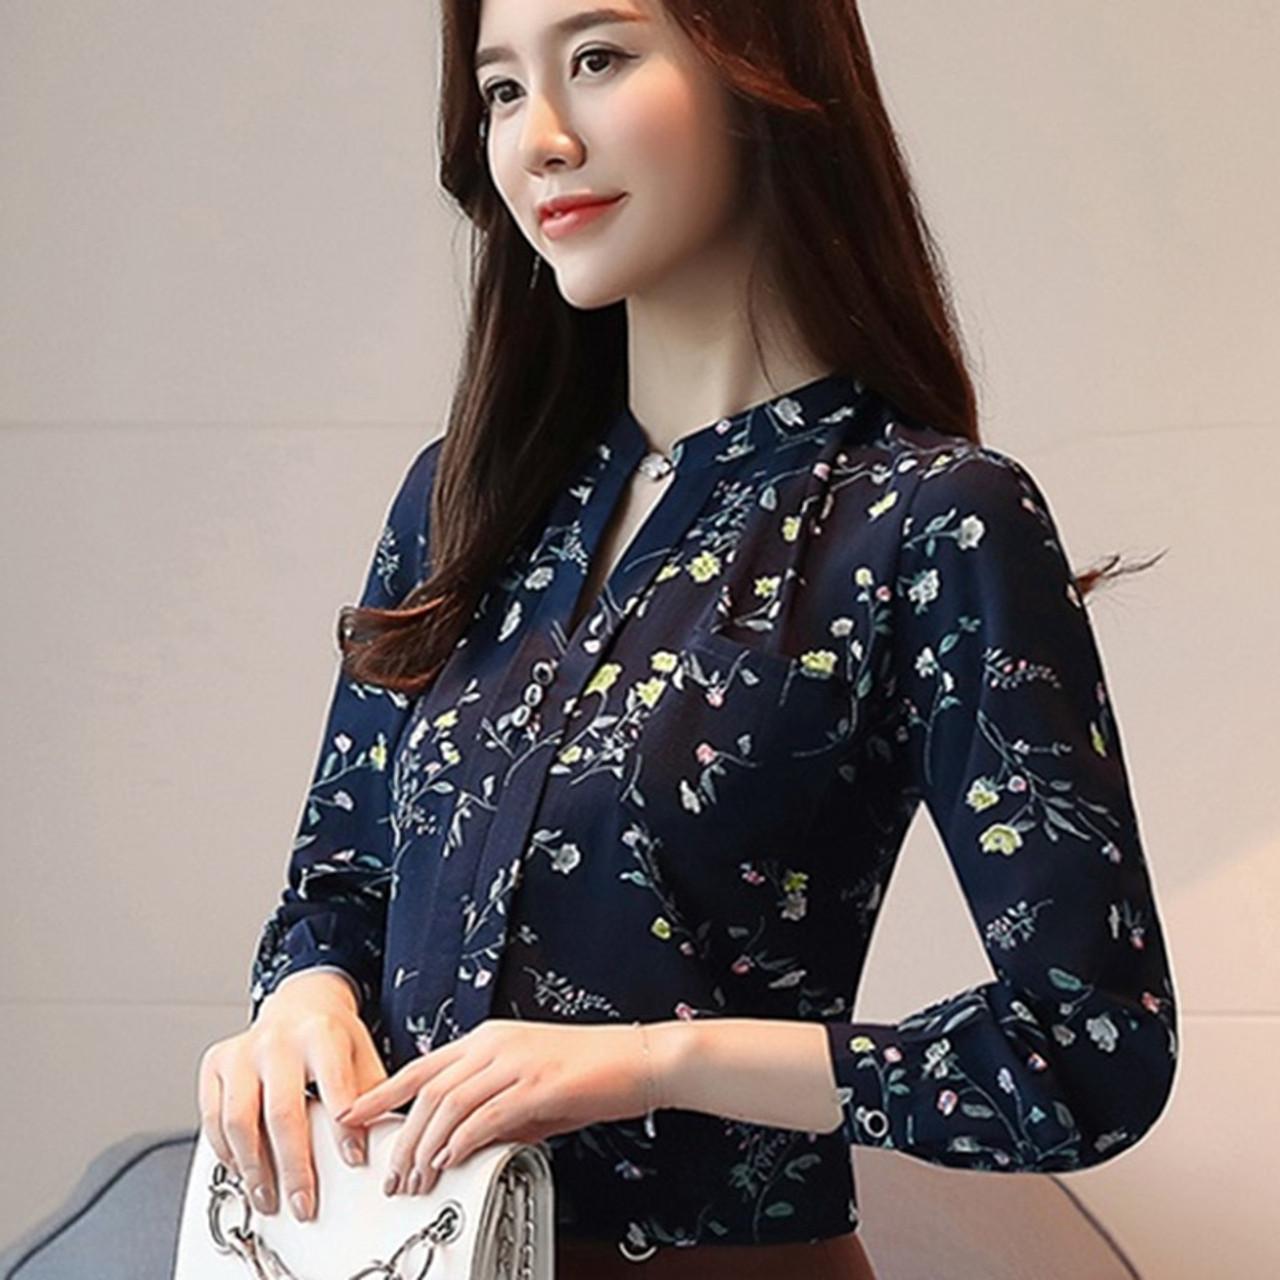 b3e3899e6ffd9 ... 2018 Womens Tops And Blouses Autumn Fashion V-Neck Chiffon Blouses Slim  Women Chiffon Blouse ...